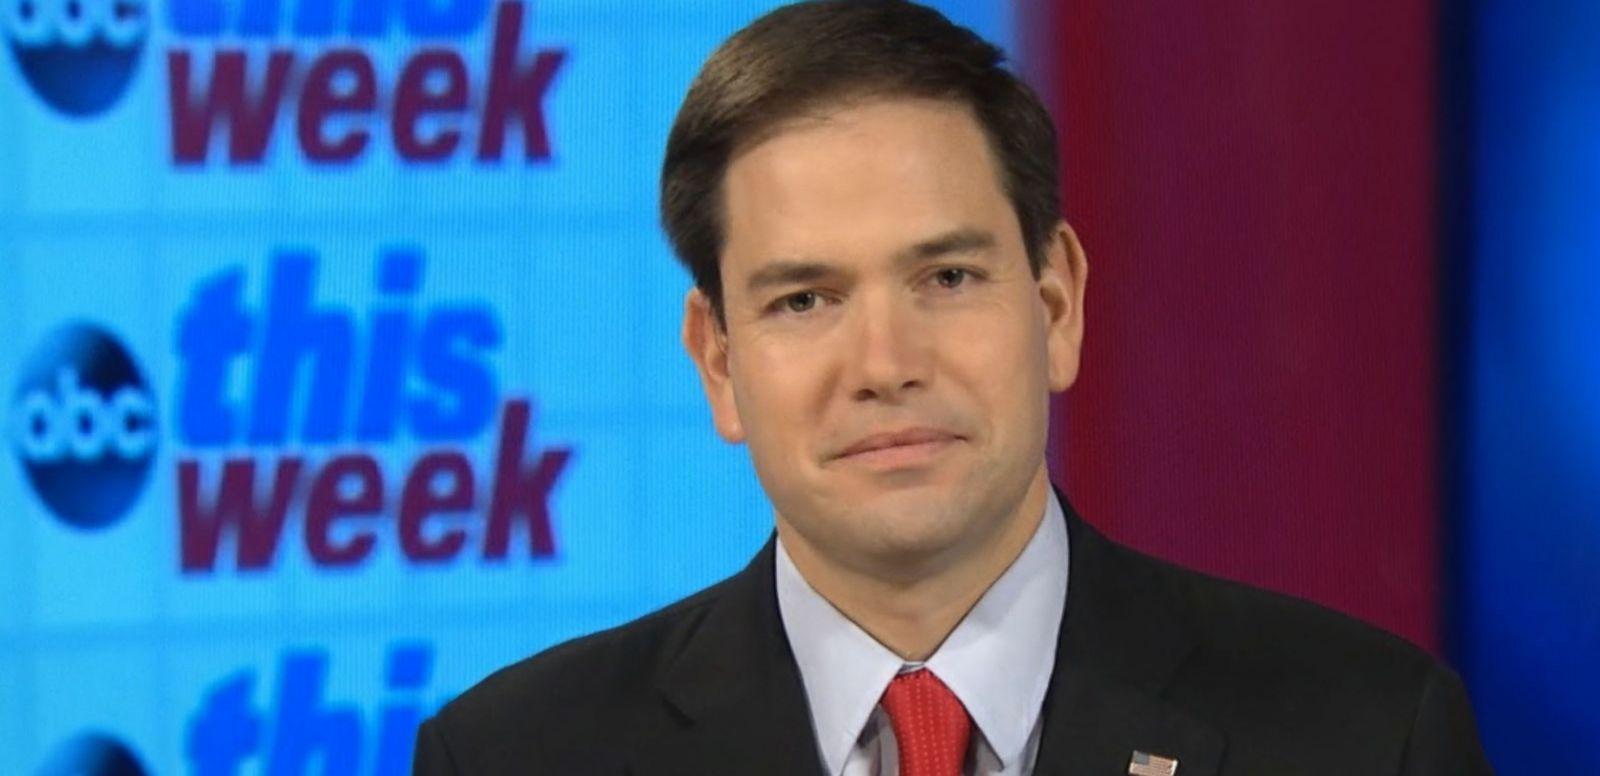 VIDEO: Sen. Marco Rubio on Cuba: Engagement Won't Guarantee Freedom